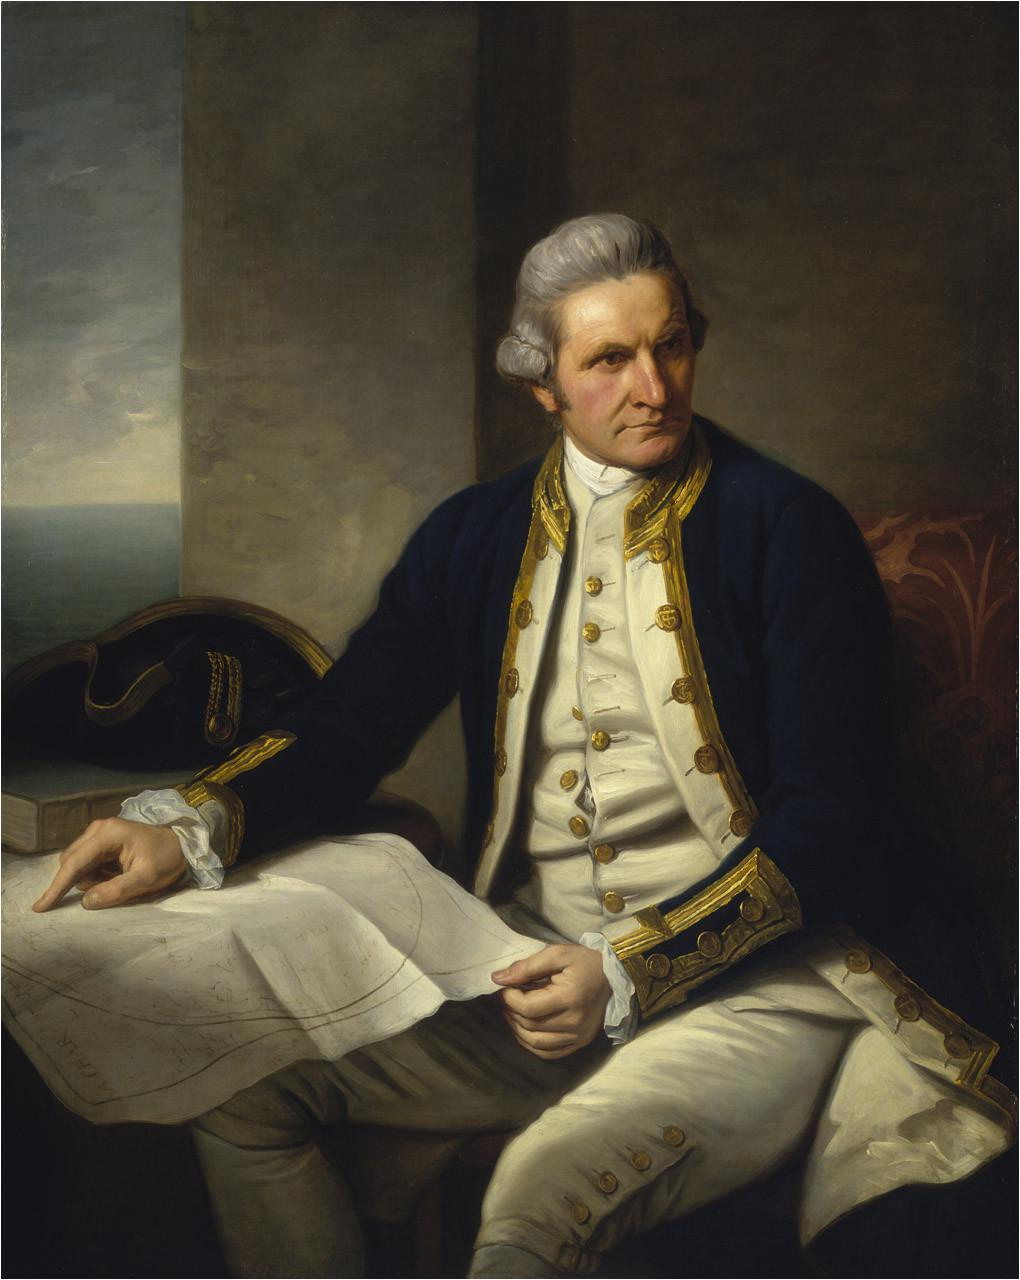 James Cook Lebenslauf Englisch James Cook –